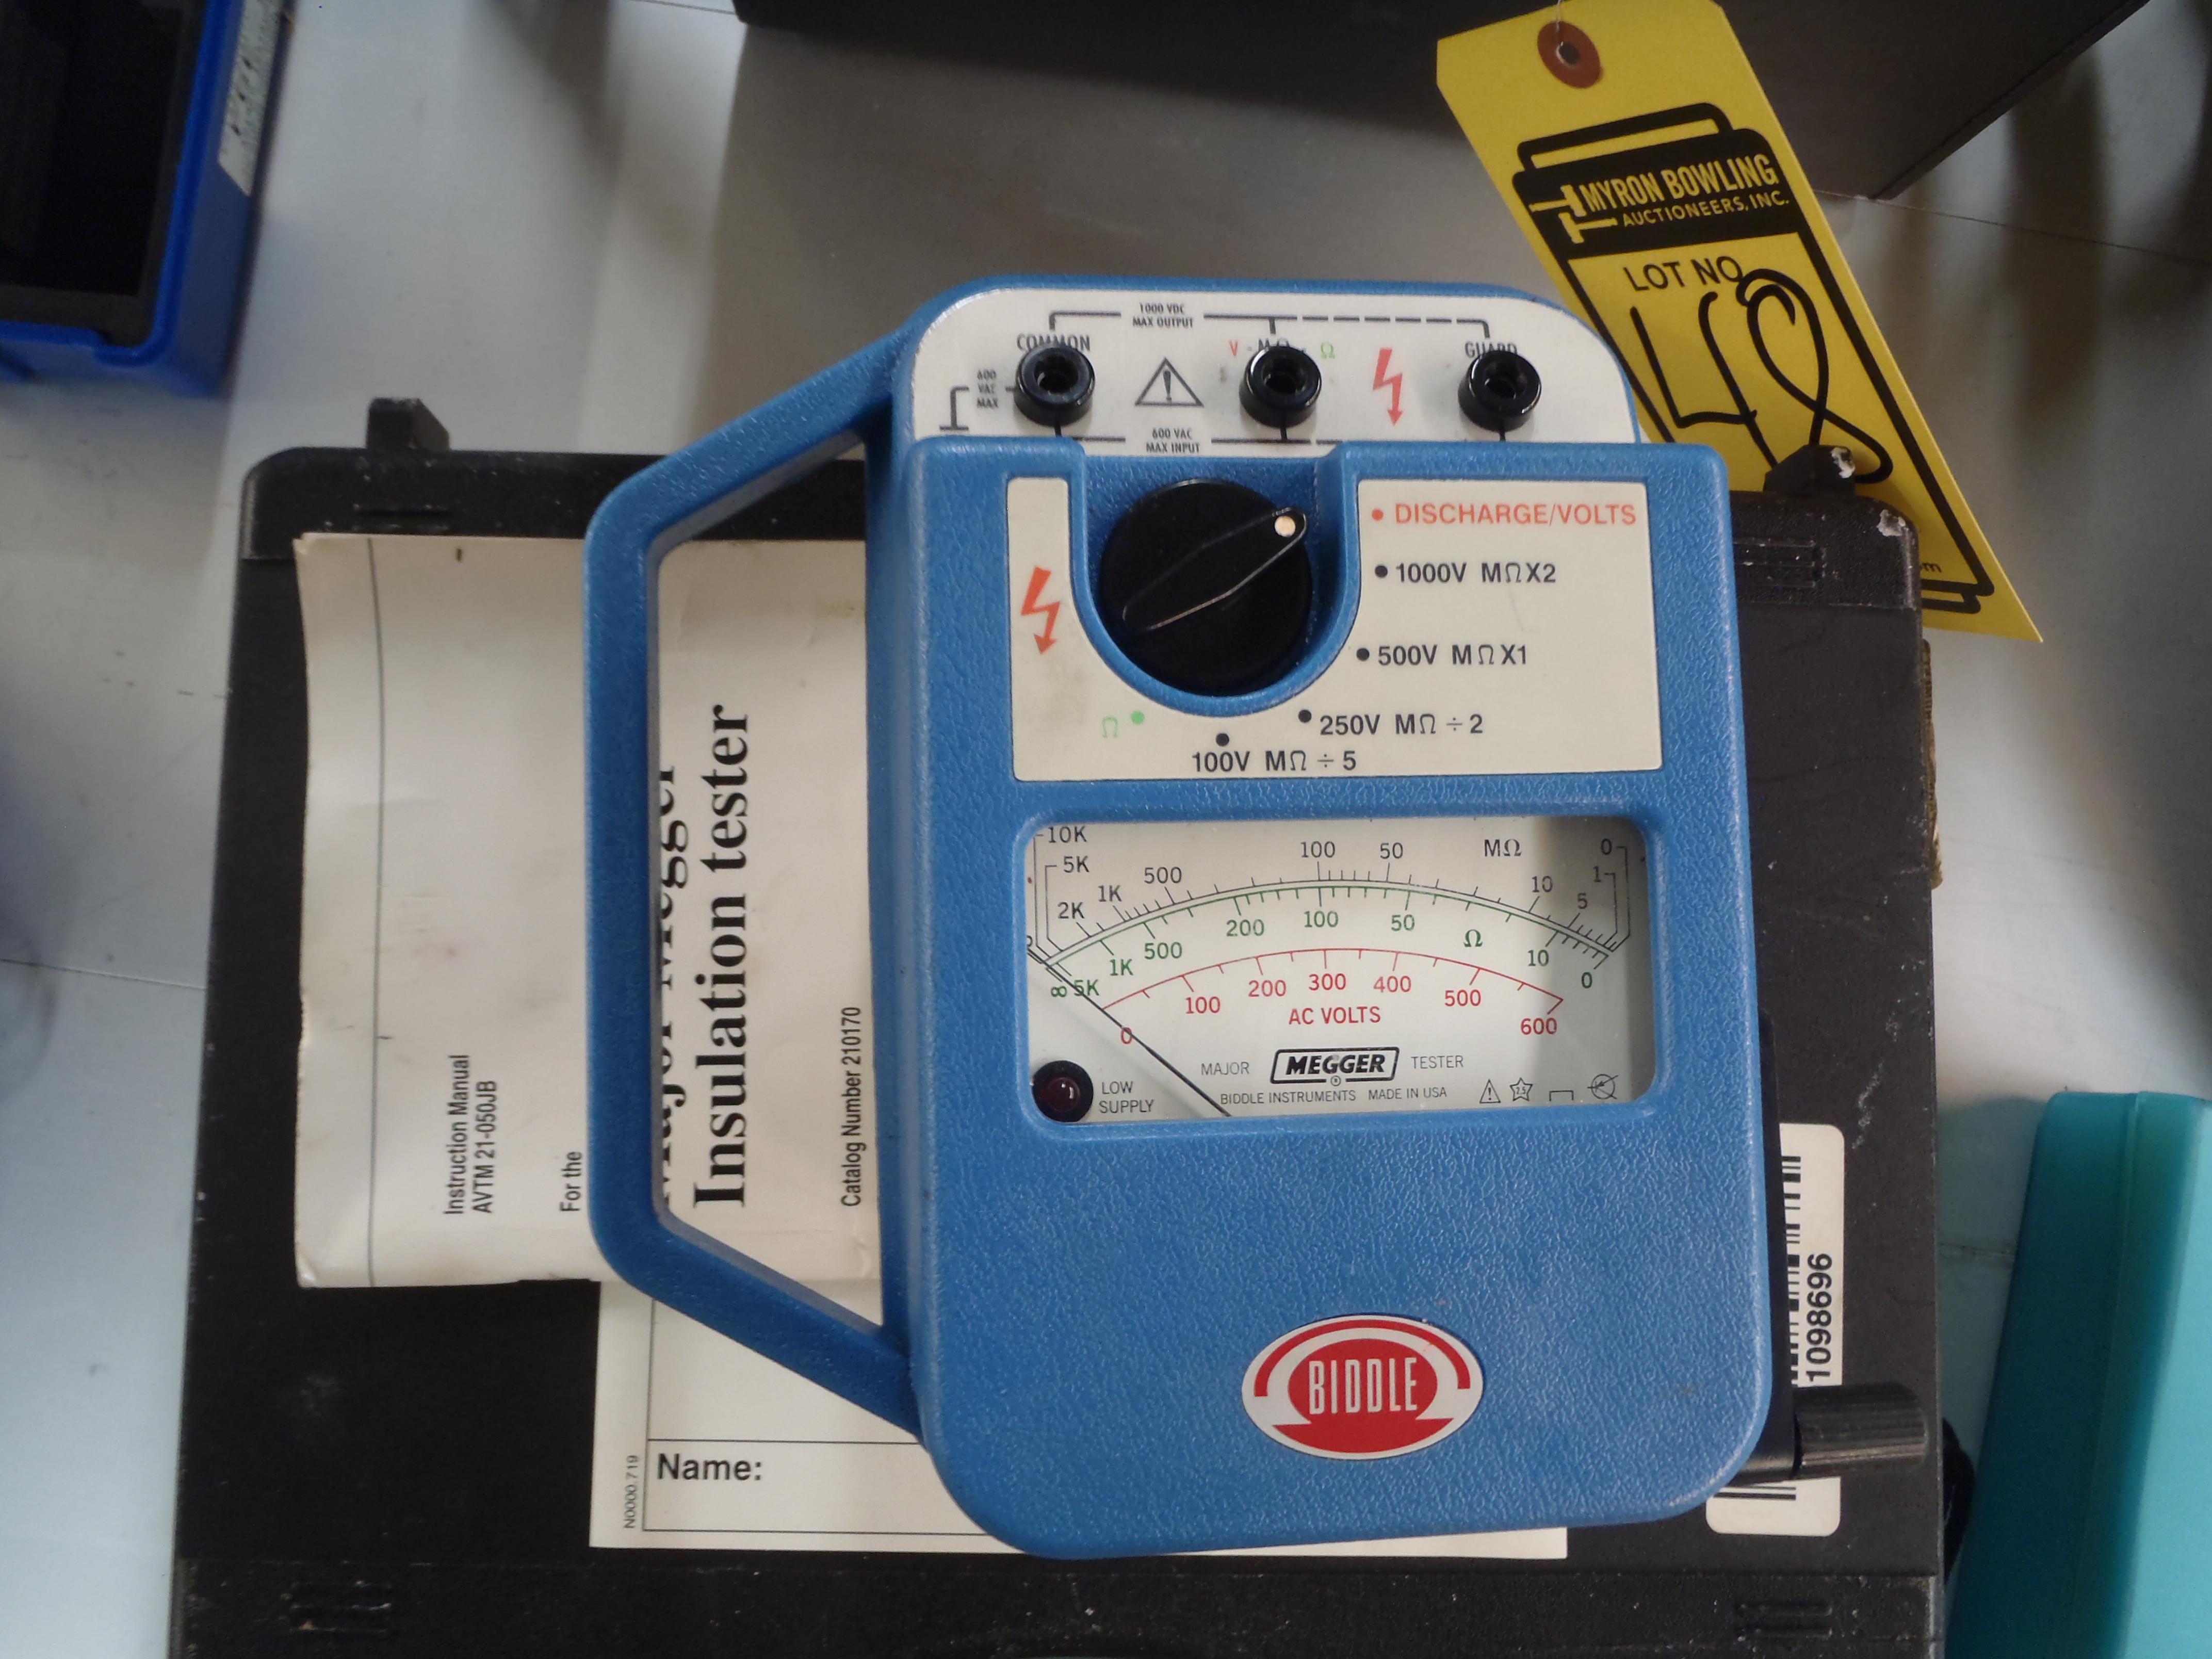 Group Of Lots 45 46 47 48 Biddle Instruments Major Megger Insulation Tester S N 210170